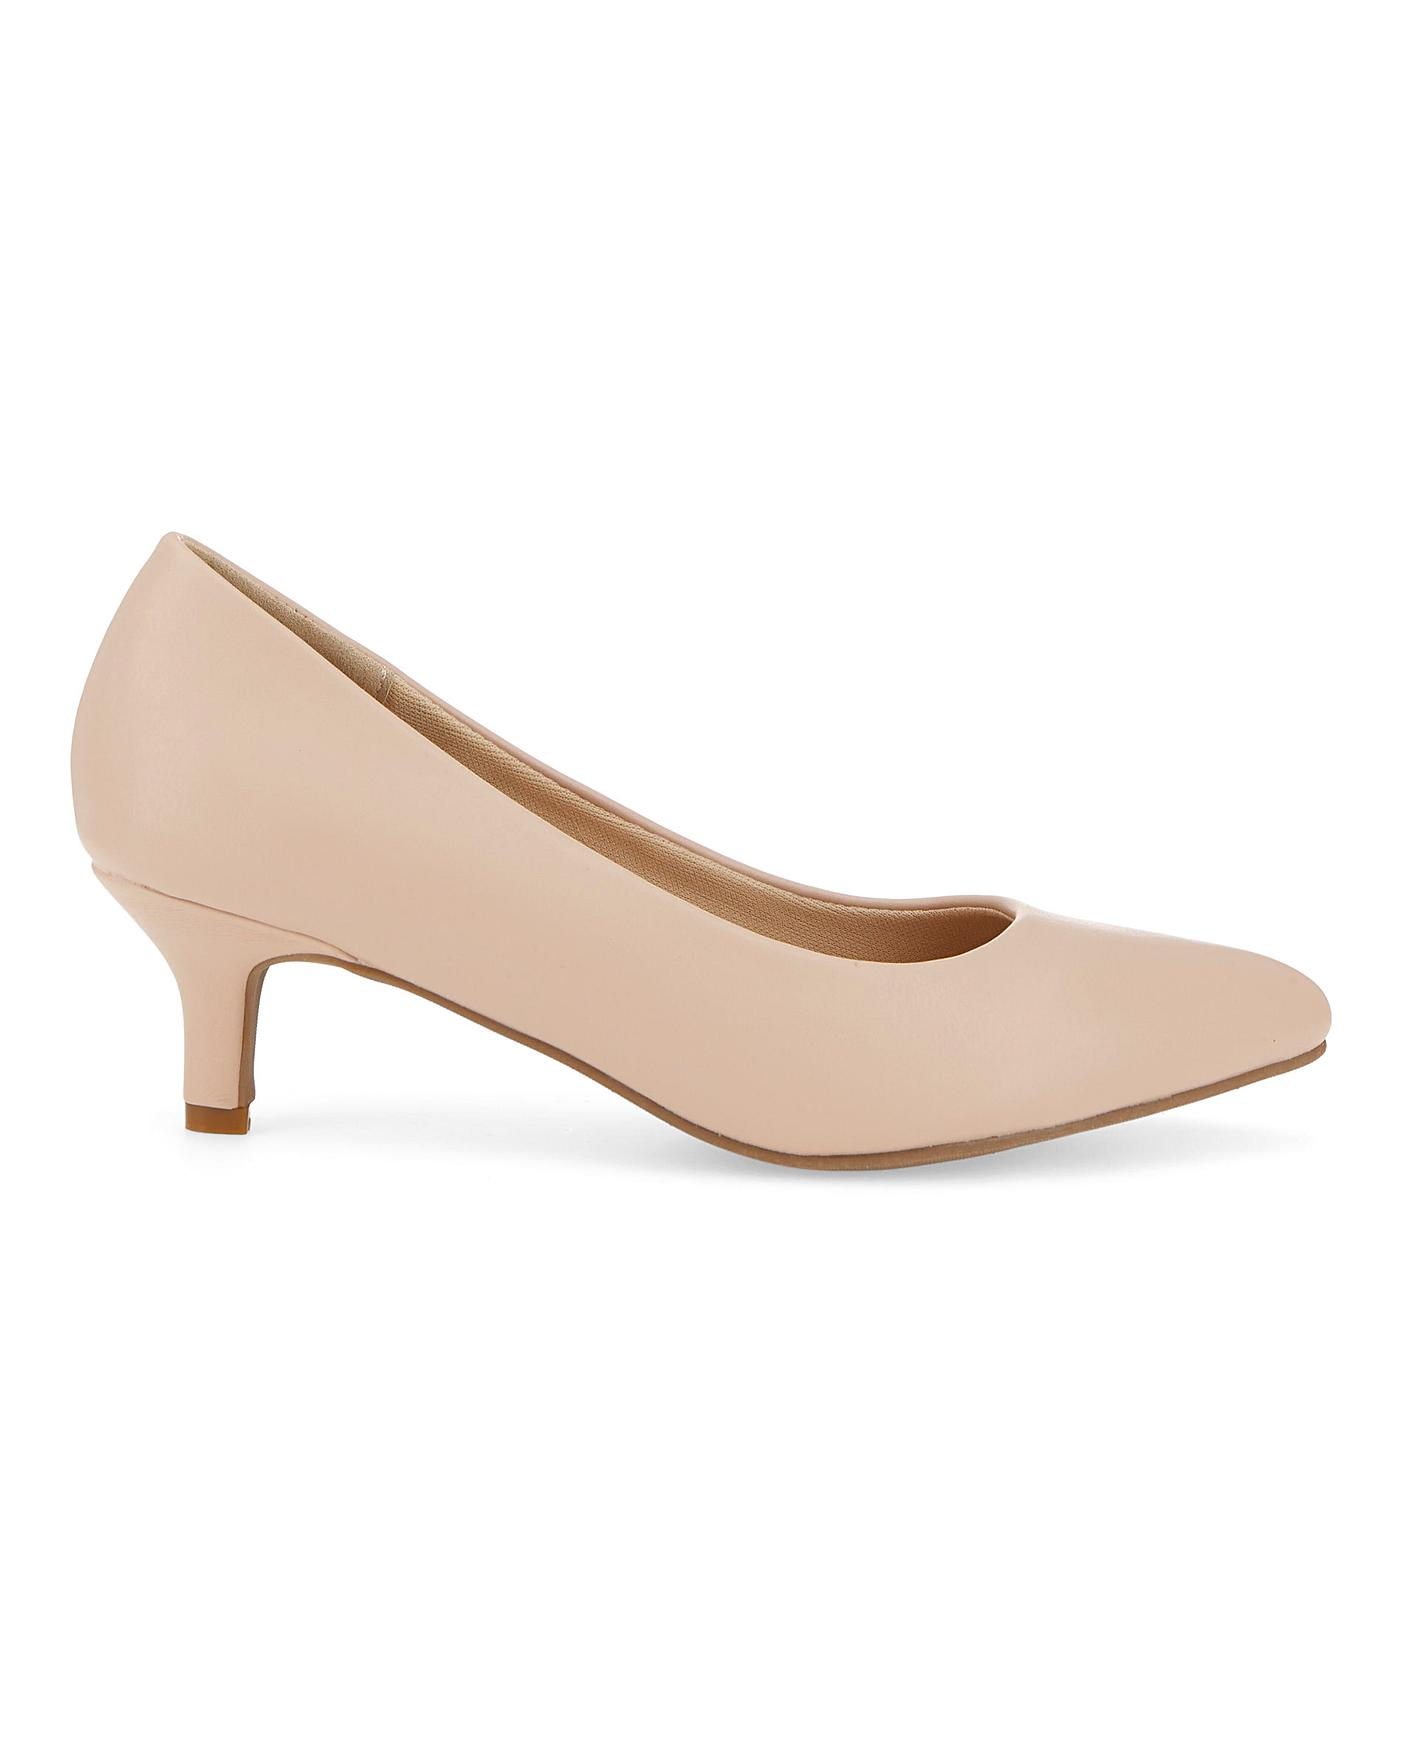 Flexi Sole Kitten Heel Shoes EEE Fit